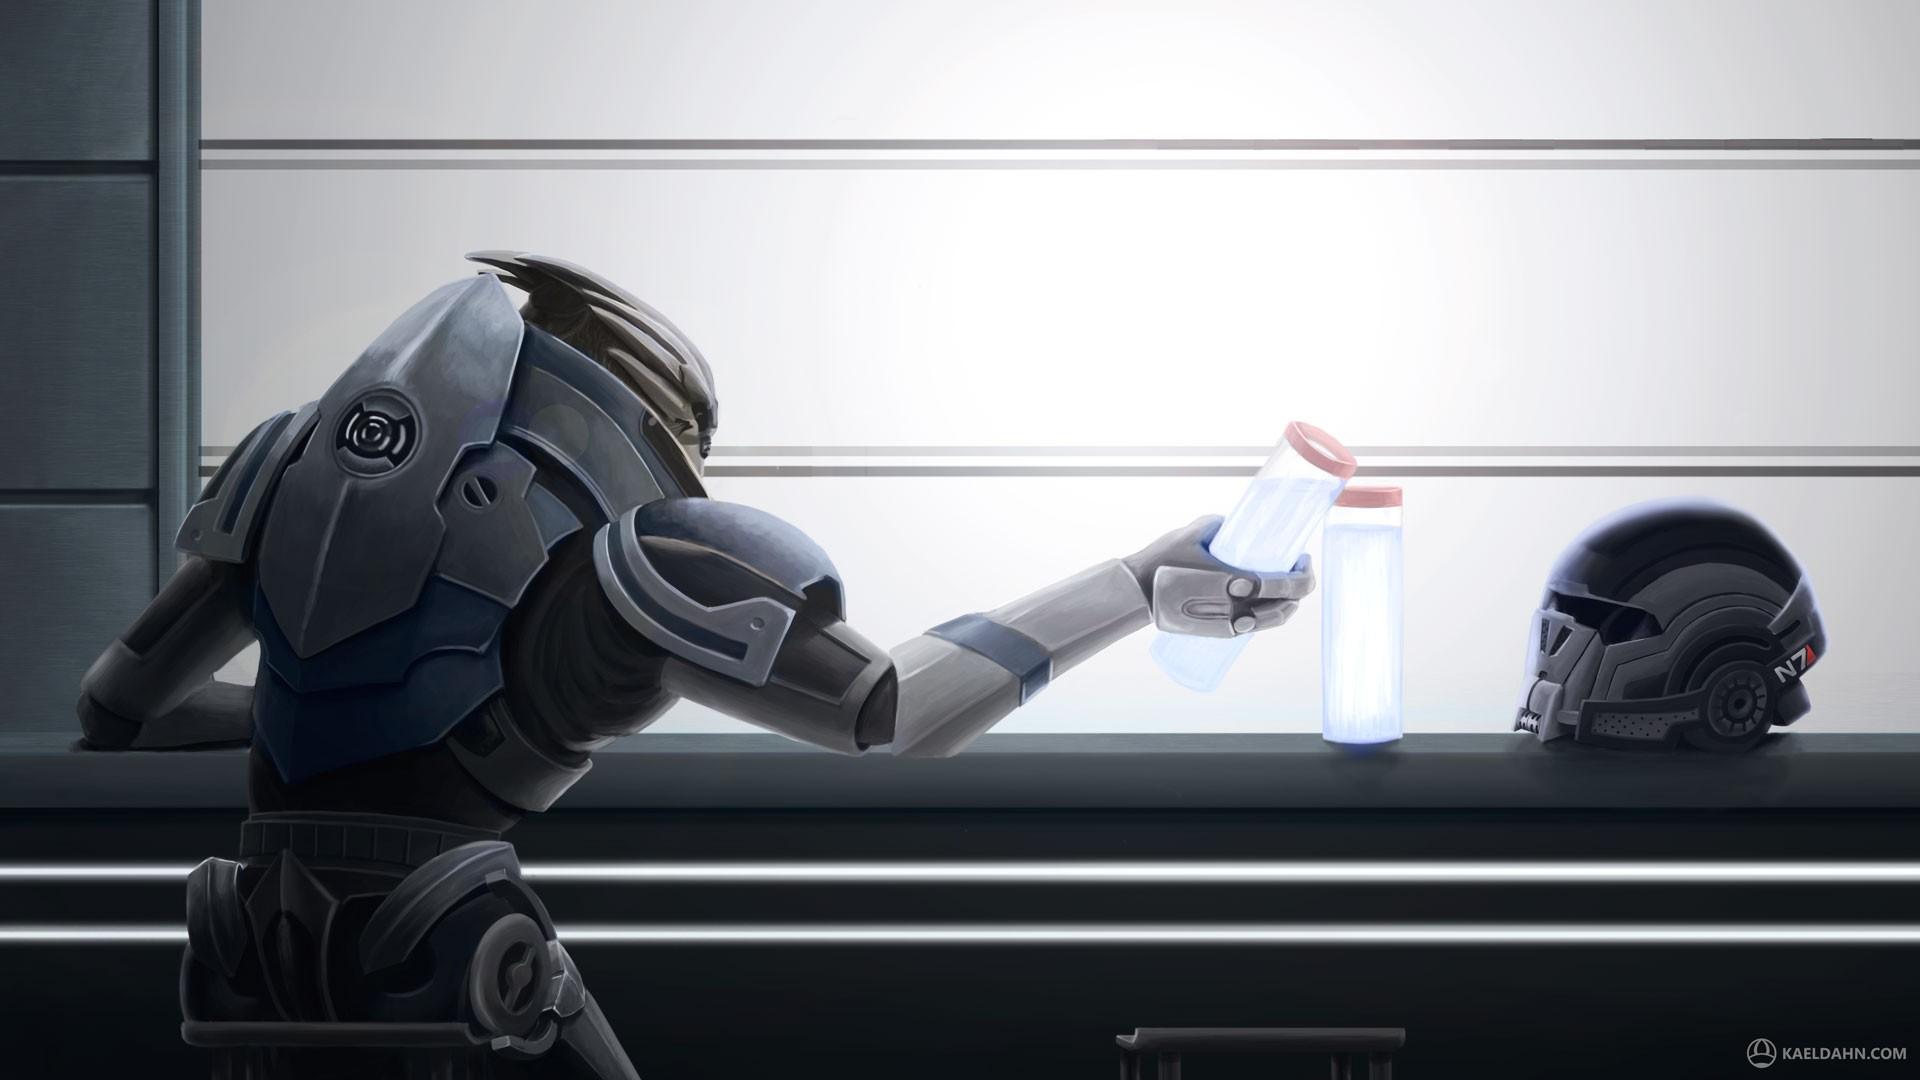 General 1920x1080 Mass Effect Garrus Vakarian video games helmet PC gaming video game art science fiction